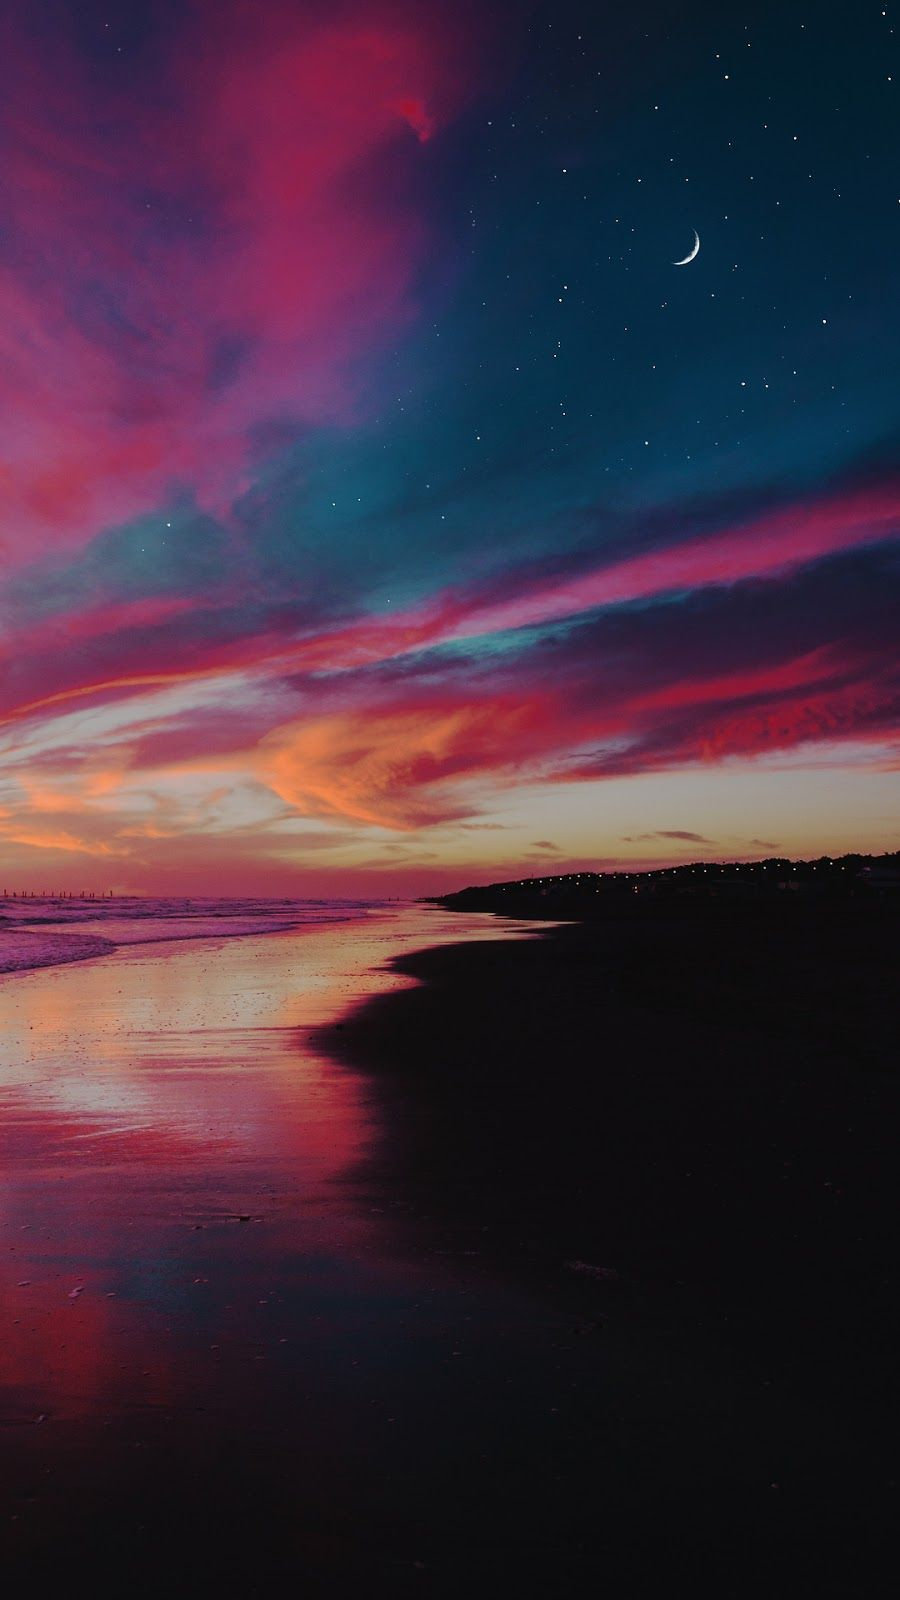 Calm Night Beautiful Wallpaper Sunset Iphone Wallpaper